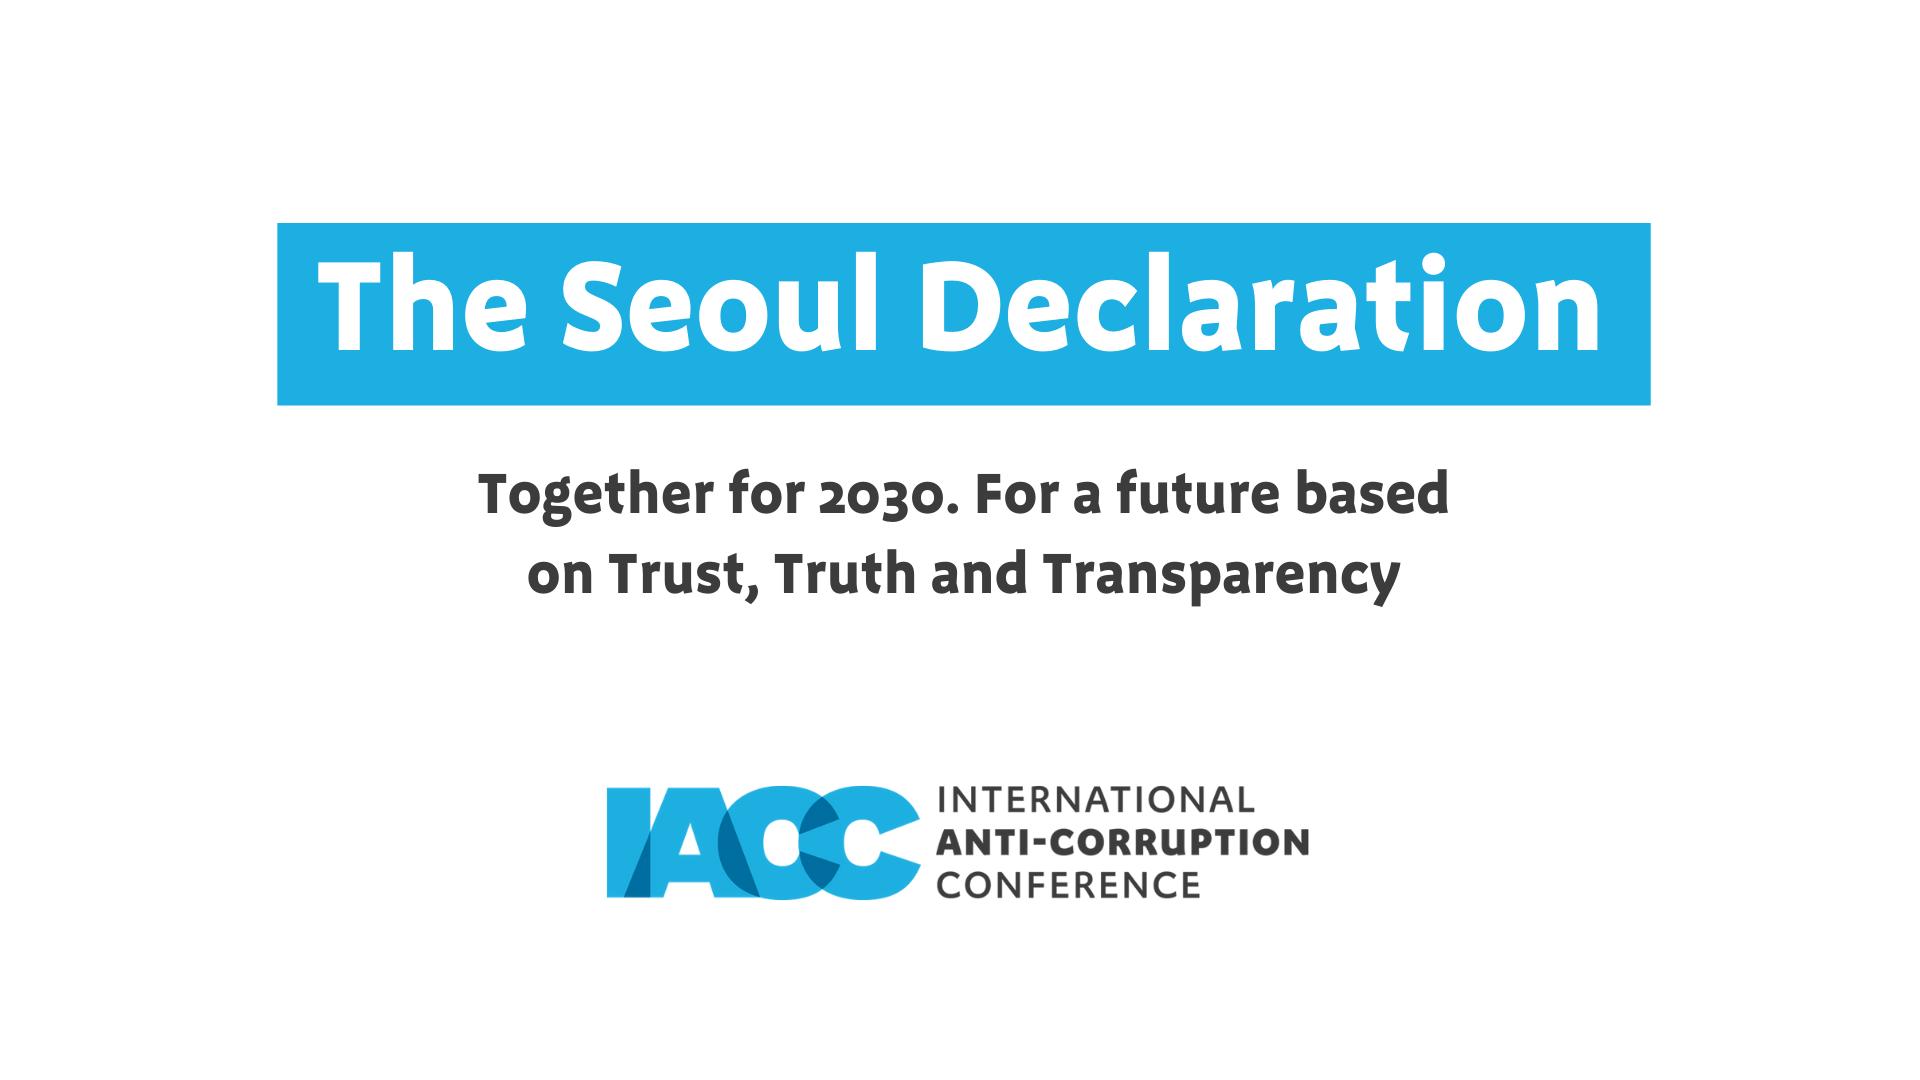 The Seoul Declaration